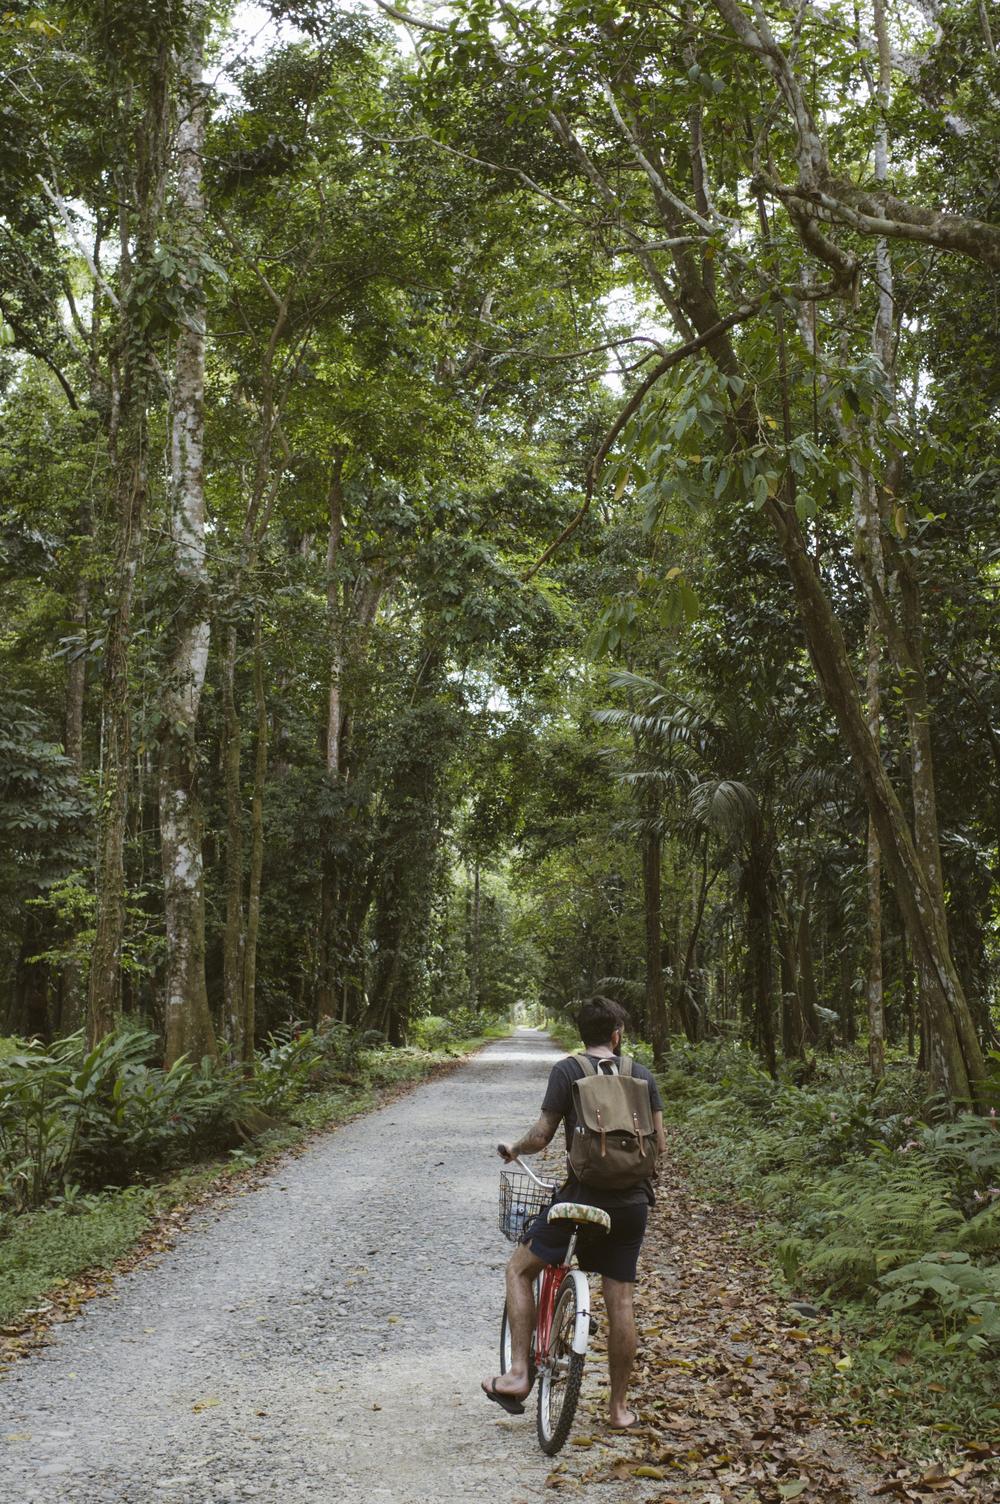 Costa_Rica_477.jpg